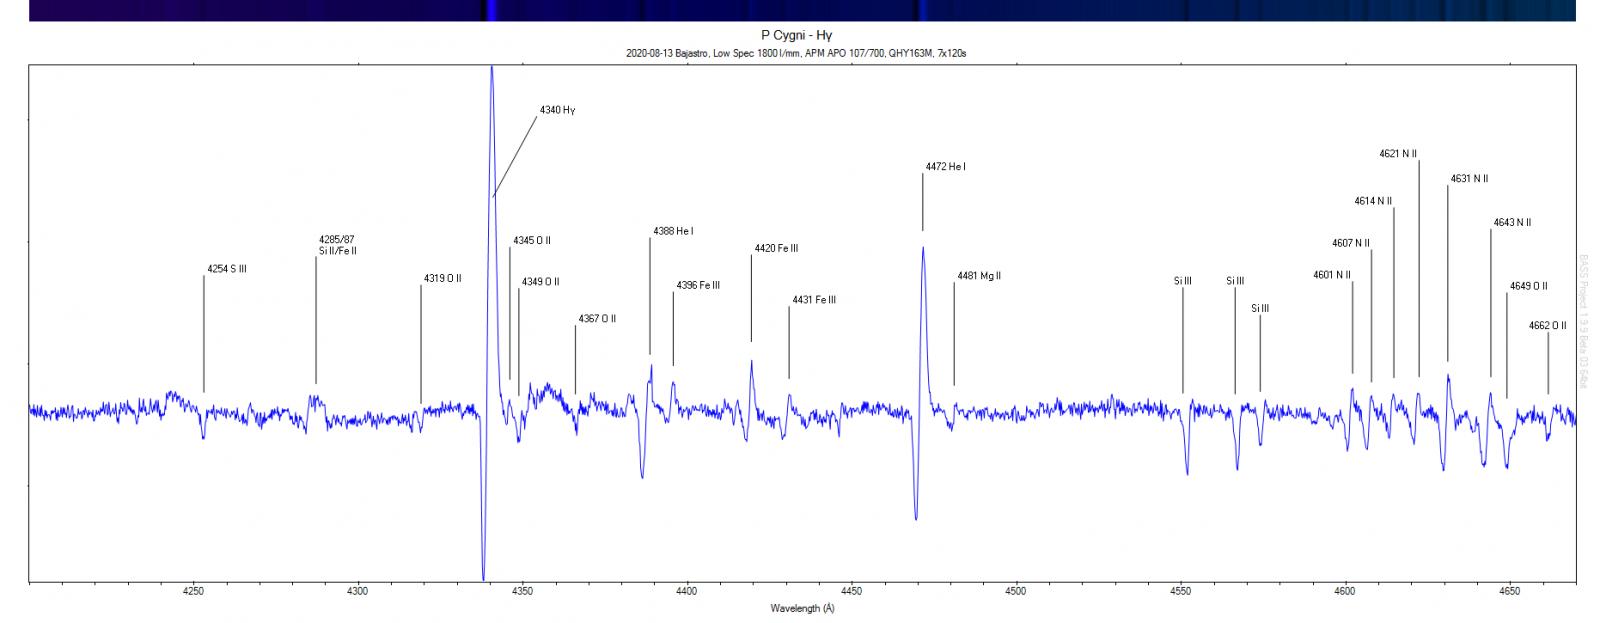 1287291146_PCygniH-gamma.thumb.PNG.08dee8d10a712c440d2c0b17602d52cc.PNG